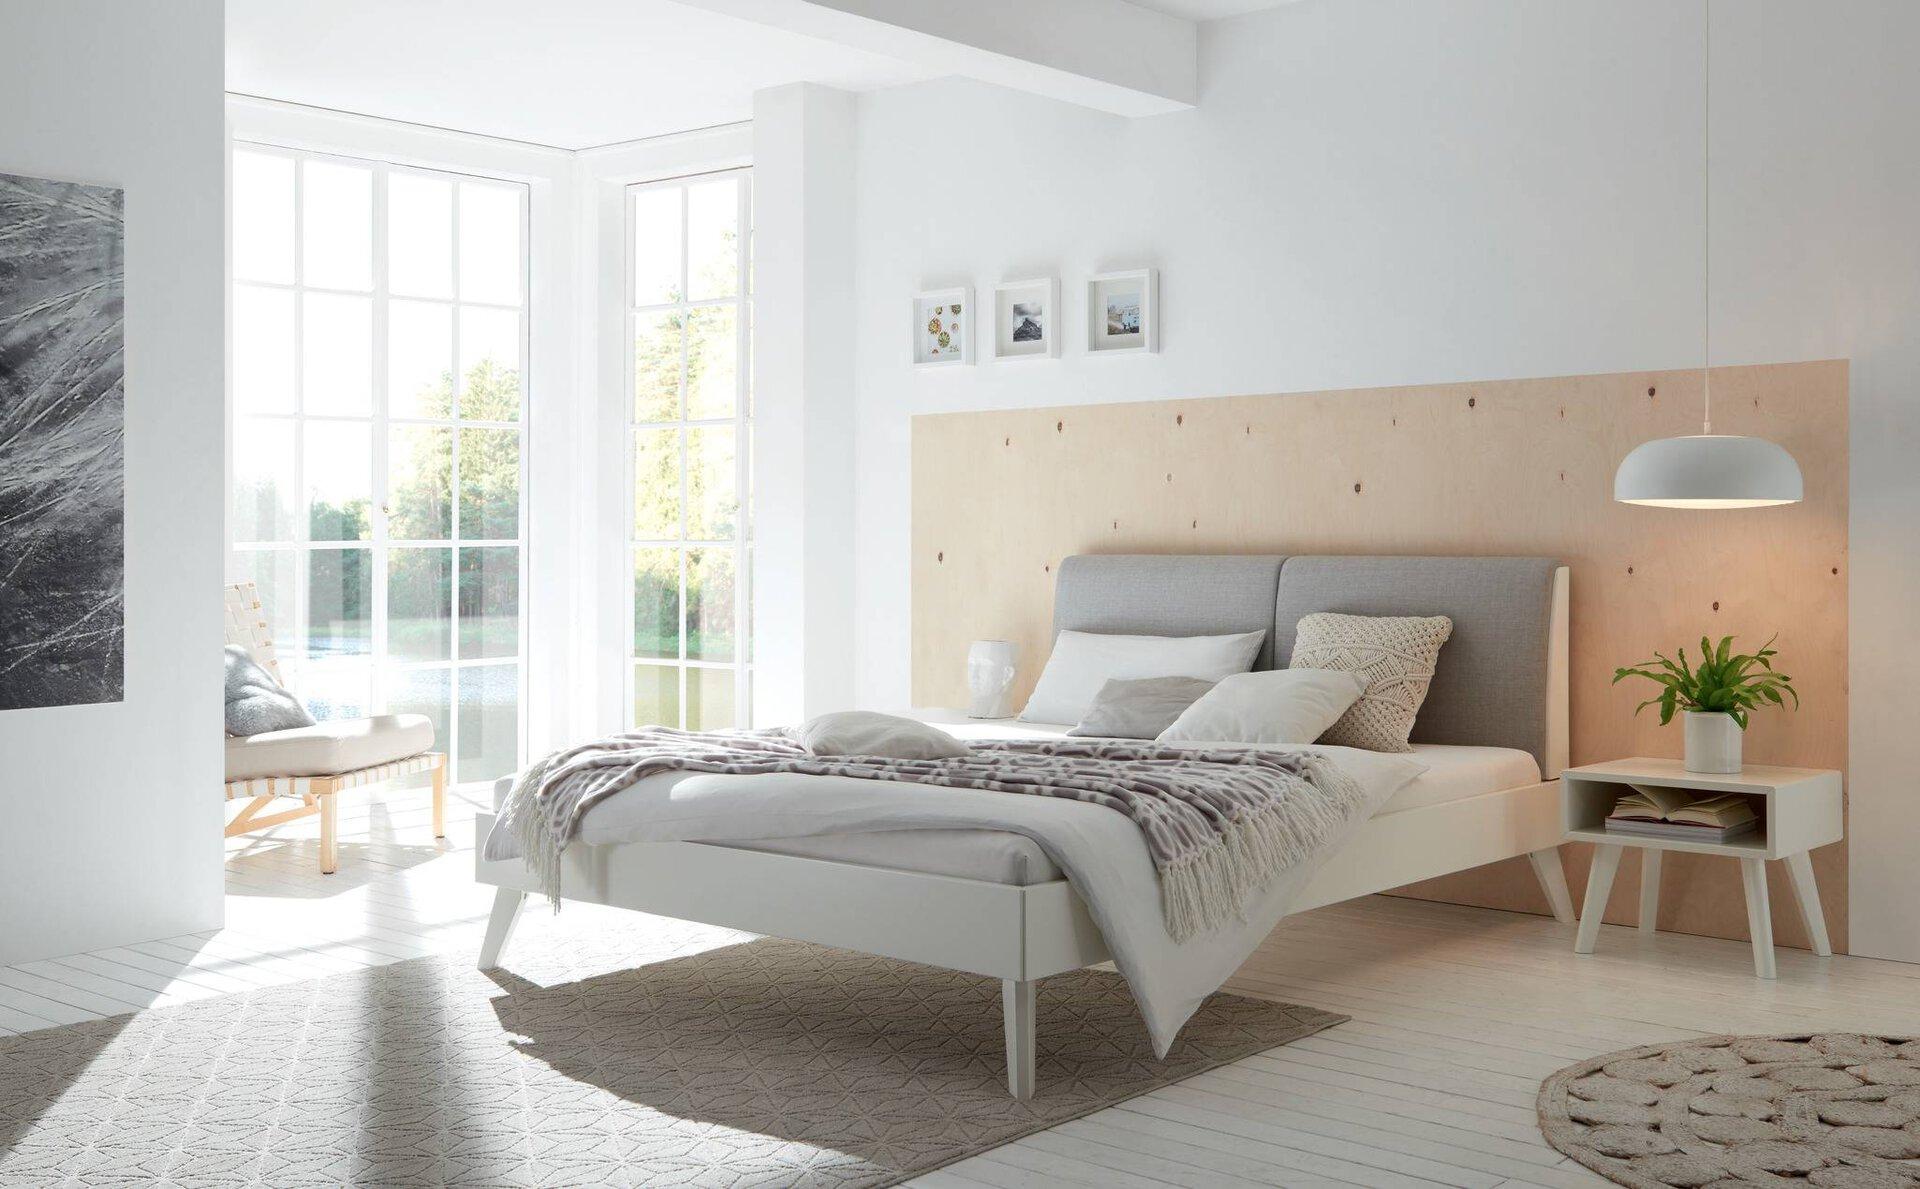 Bett SIMONE Hasena Textil weiß 146 x 91 x 215 cm